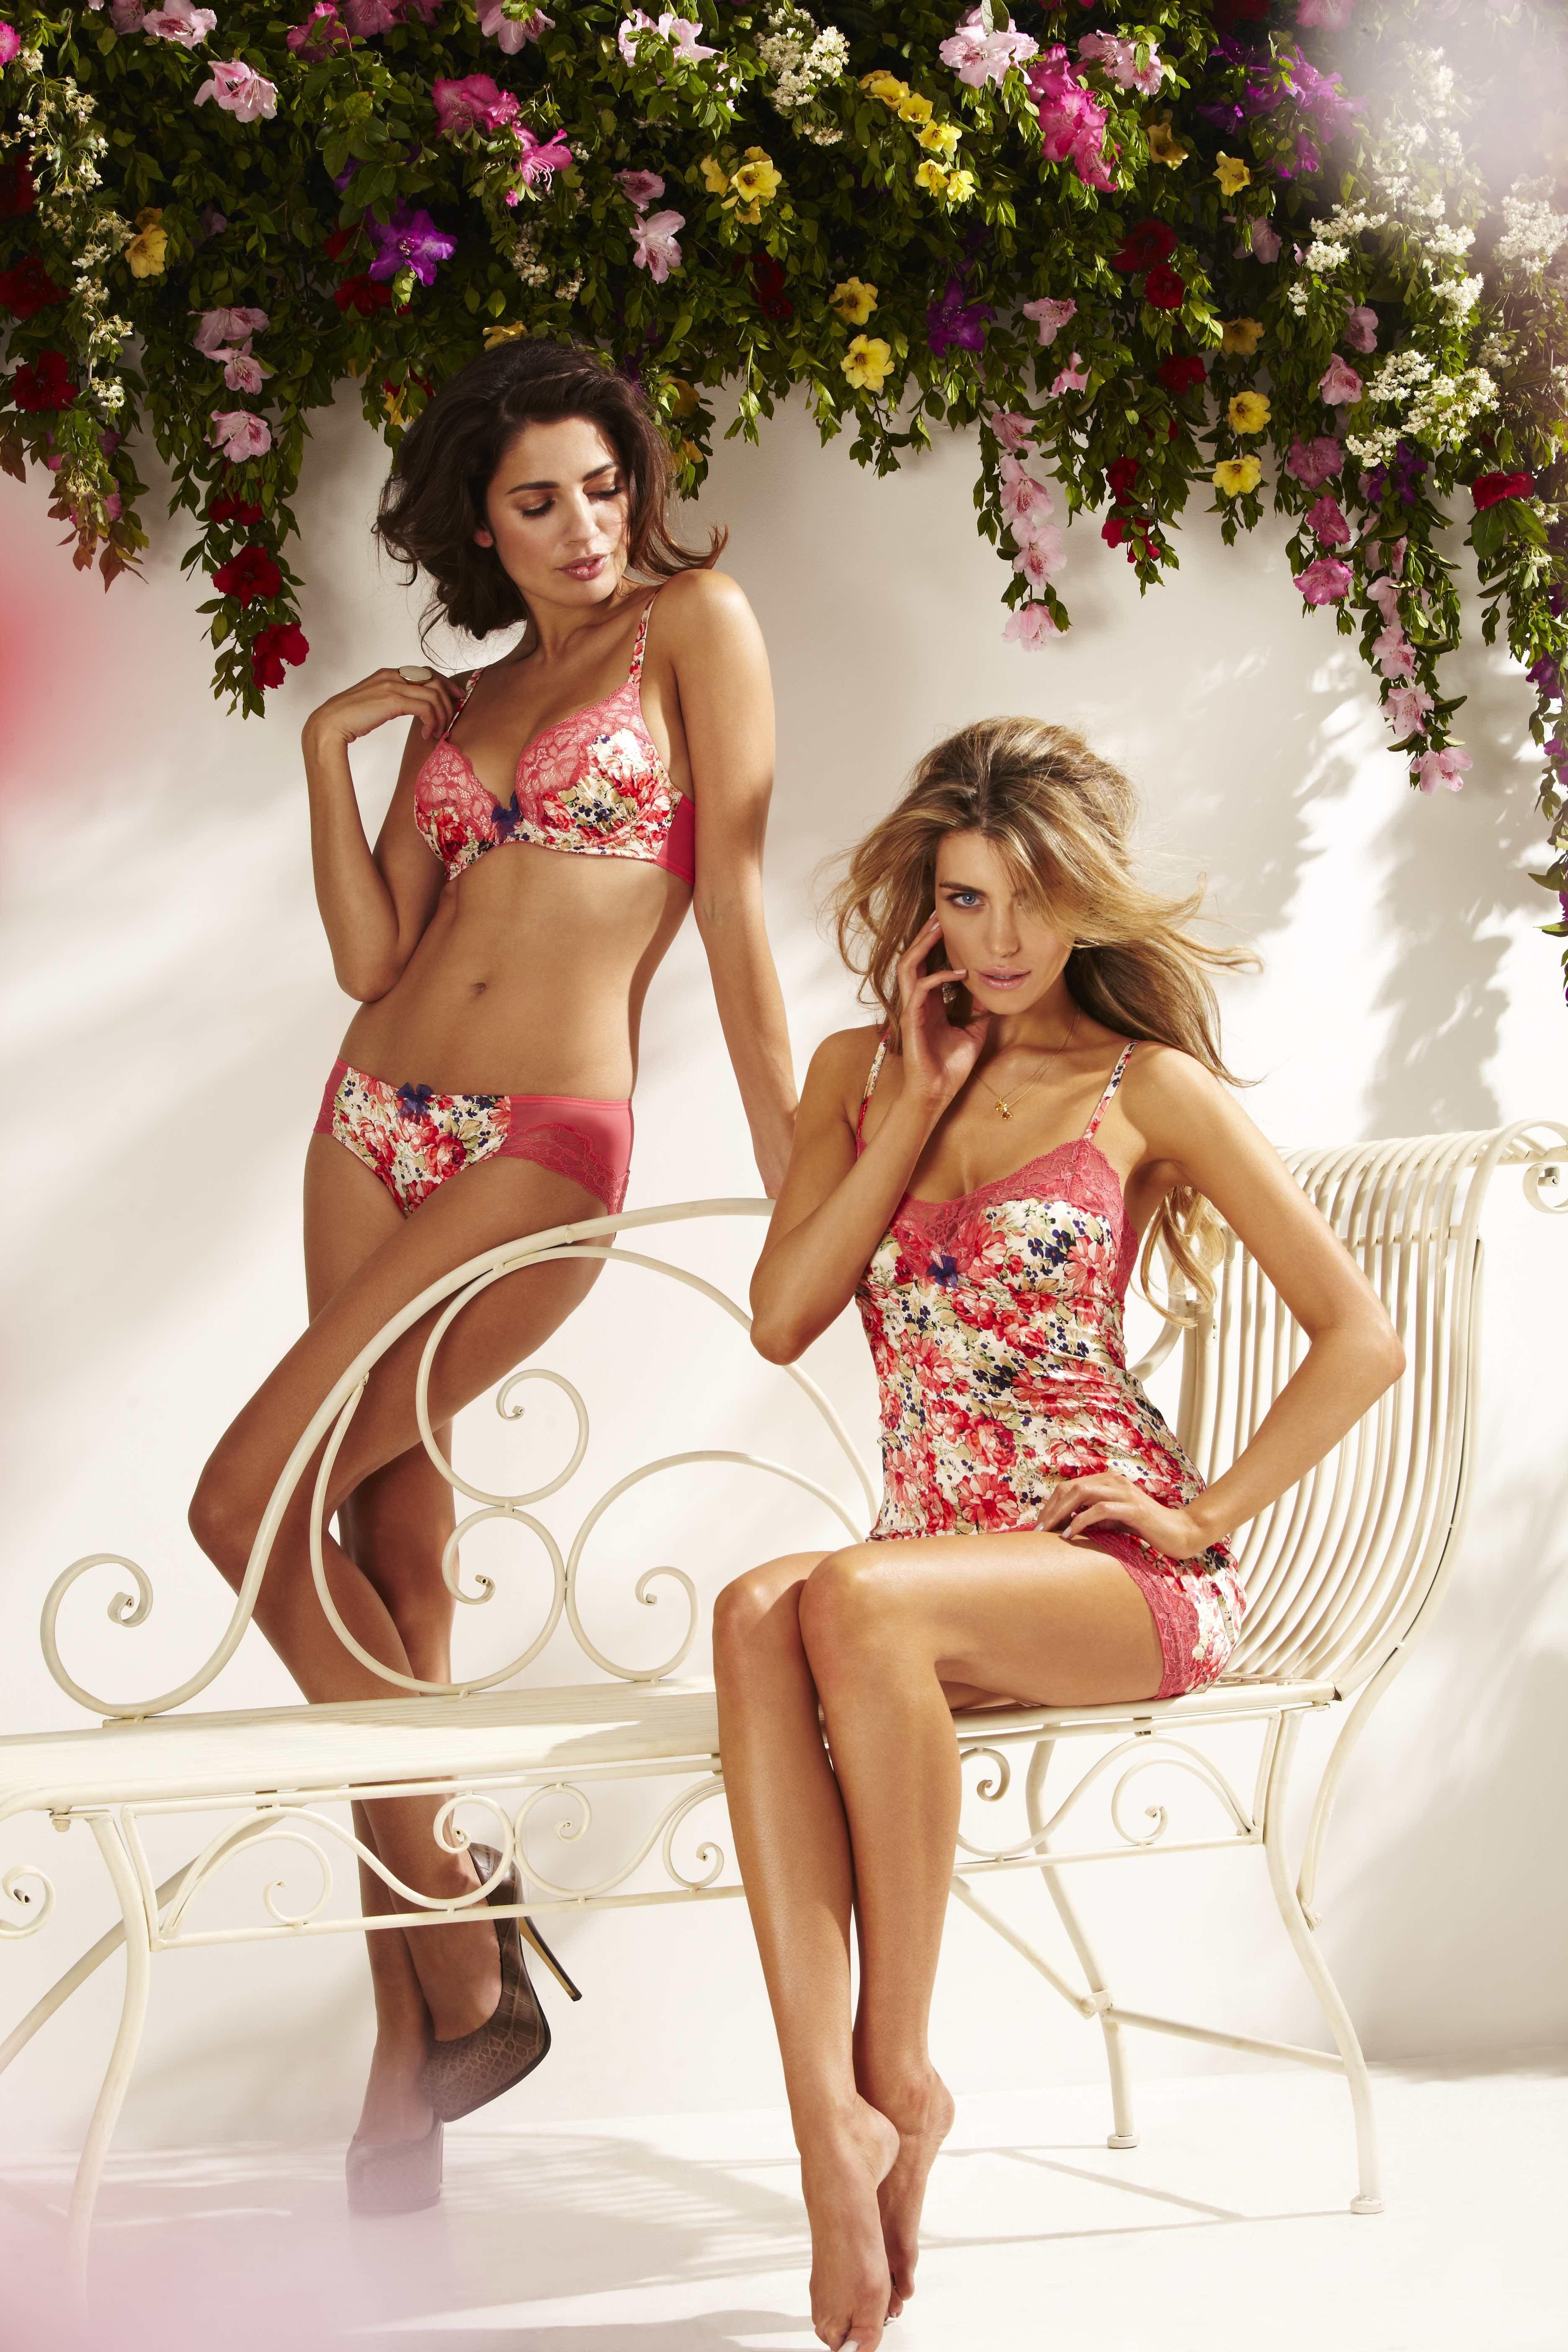 f418ec08995a2 Gossard Lingerie Spring Summer flower inspiration shoot with Elle Liberachi    Eva Smite. Photographer Ben Riggott